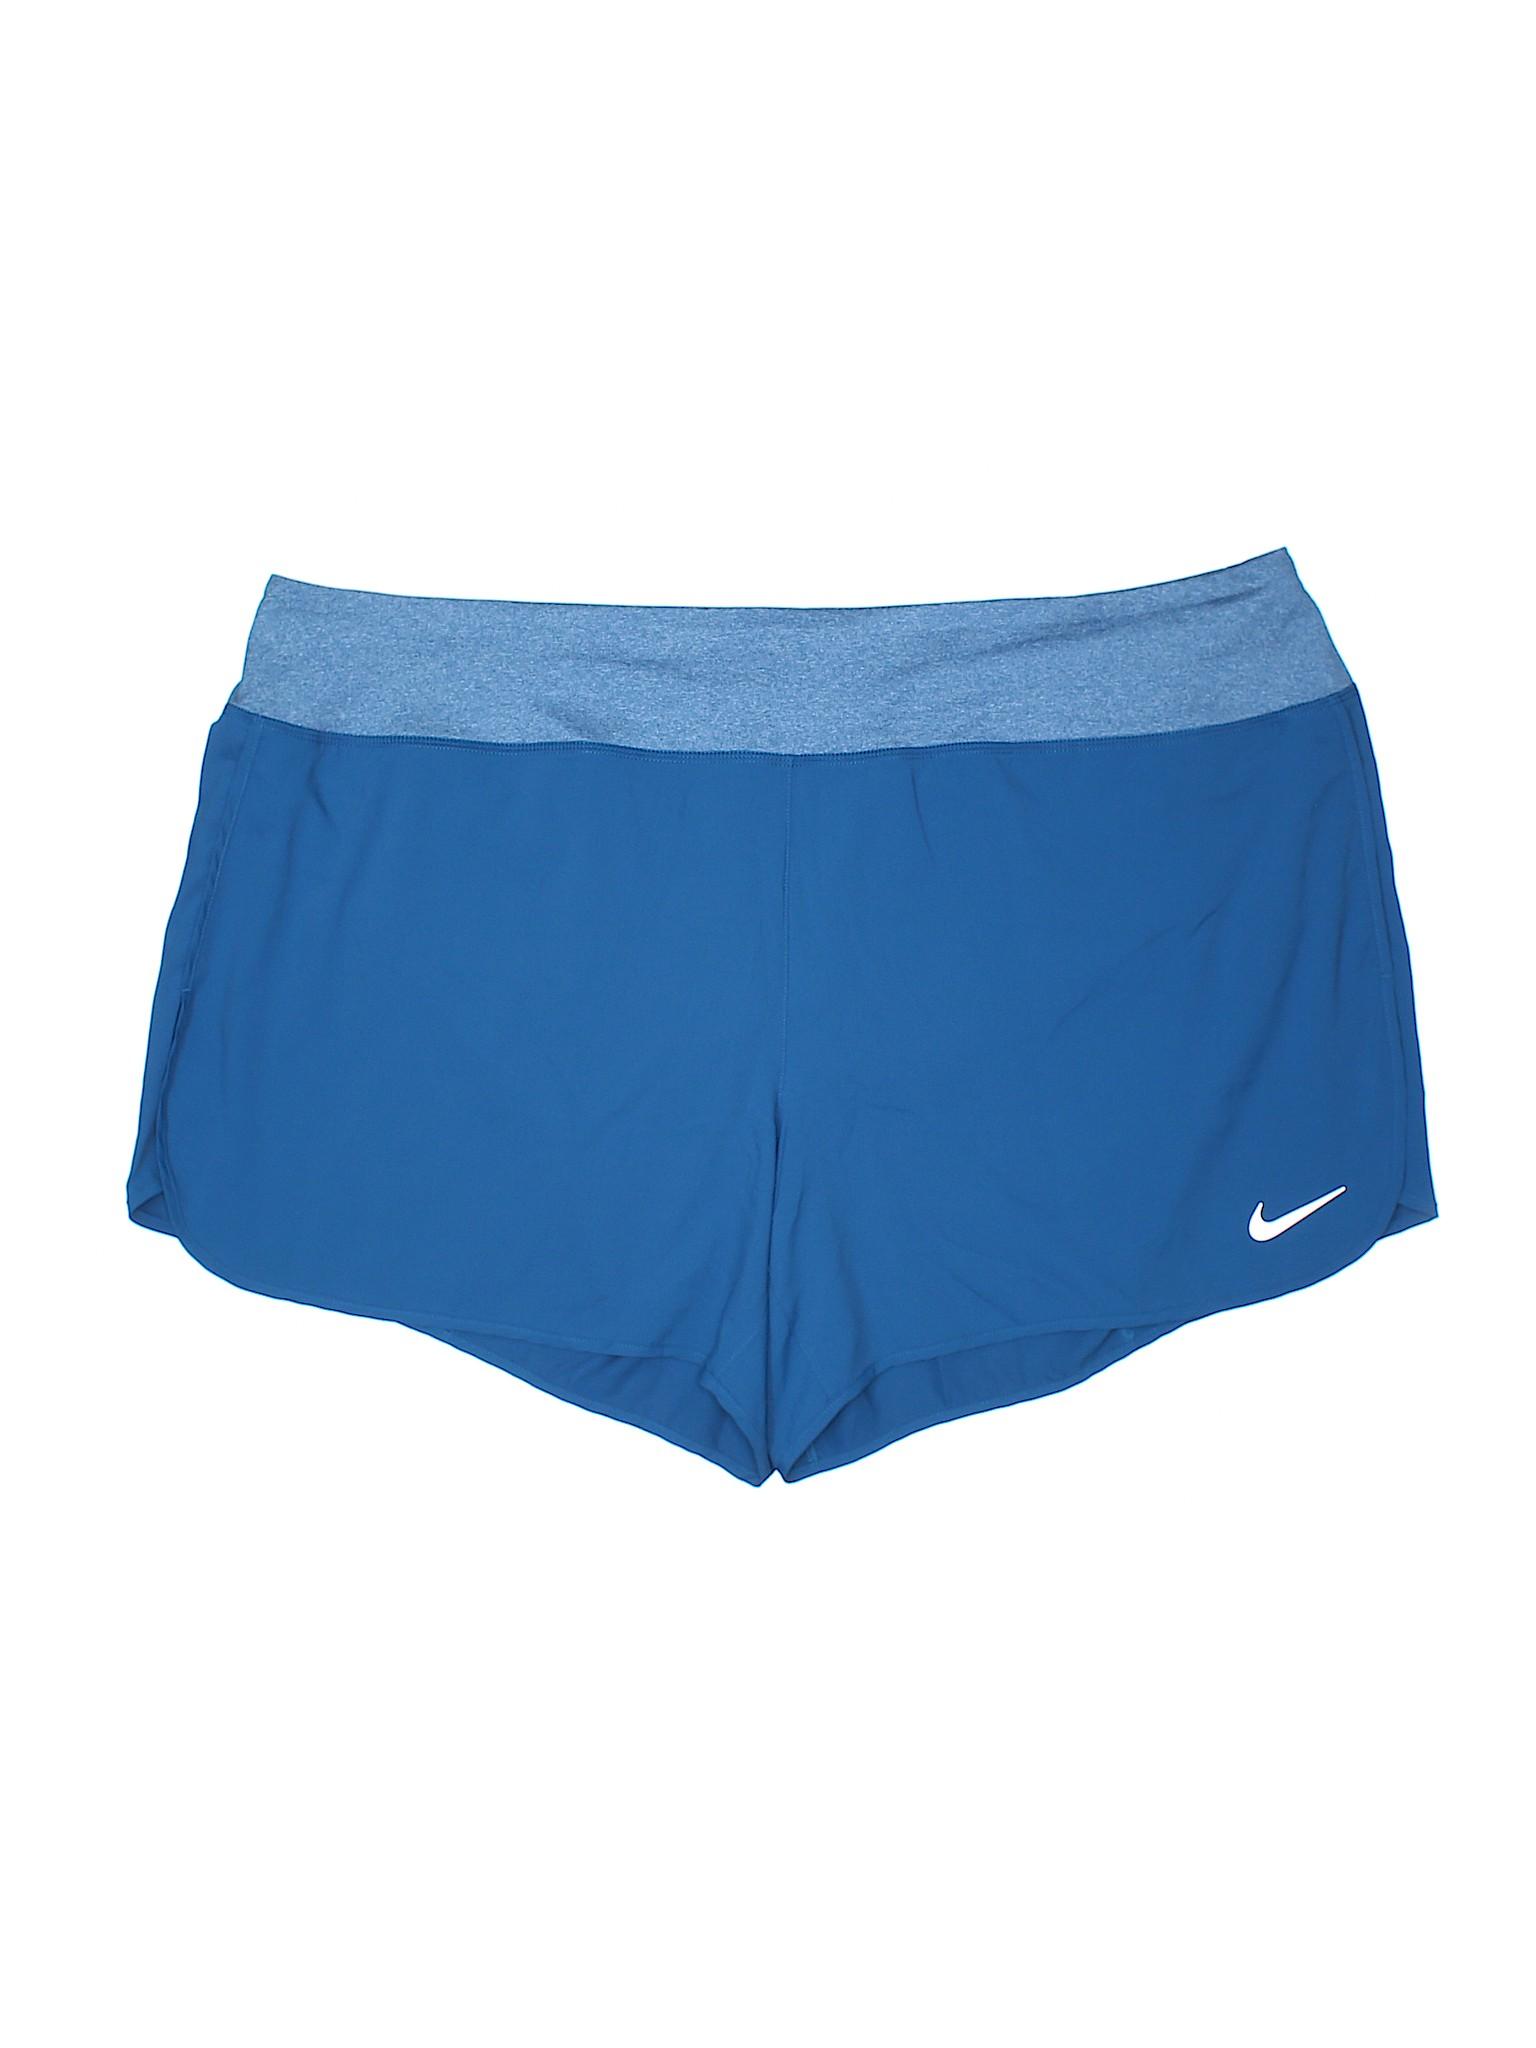 Athletic Shorts Leisure Leisure winter Nike winter qgURaqwI